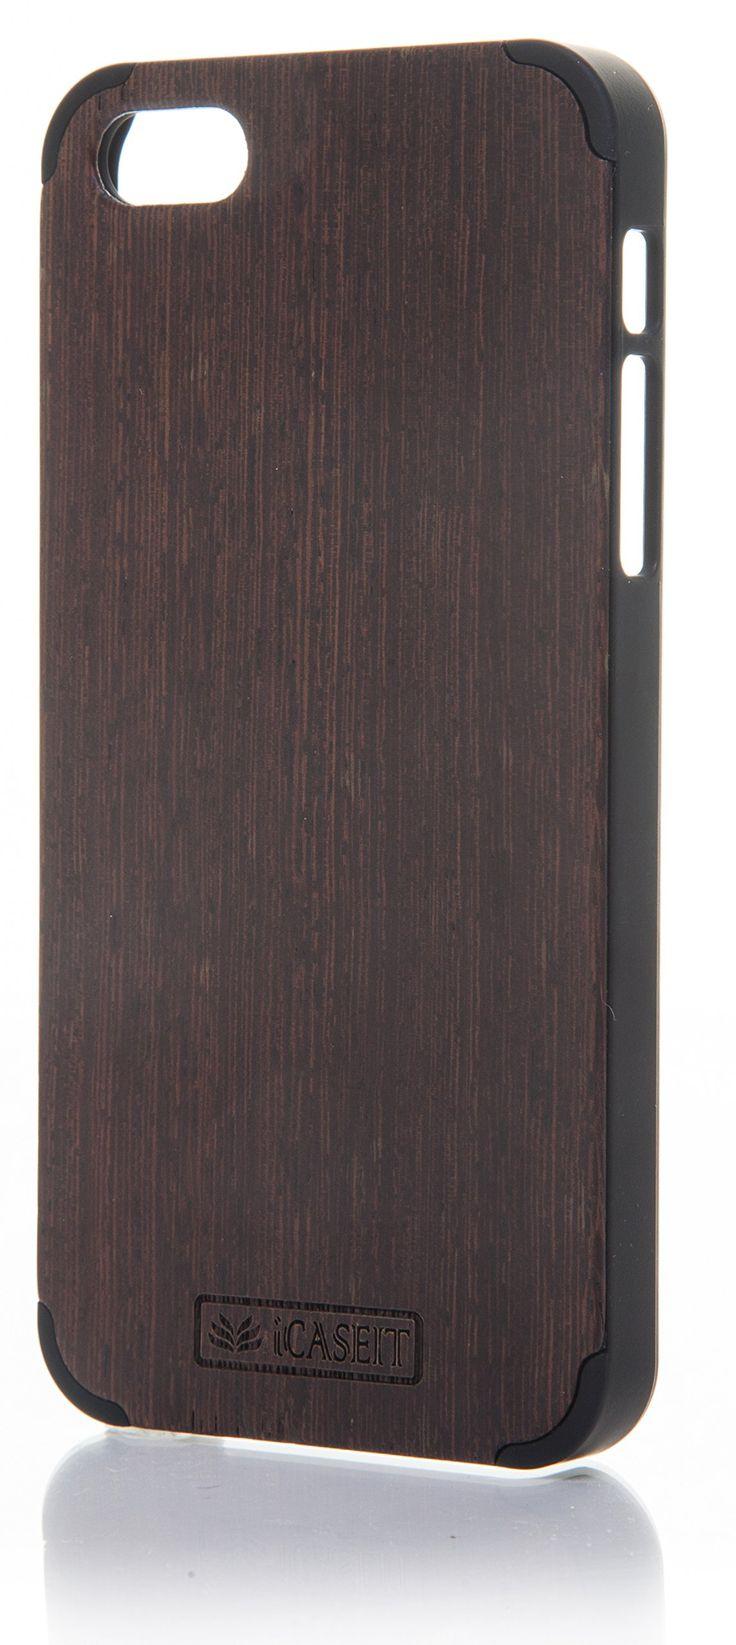 iCASEIT Wood iPhone Case - Genuinely Natural, Unique & Premium quality for iPhone 5 / 5S - Wenge / Black: Amazon.co.uk: Electronics